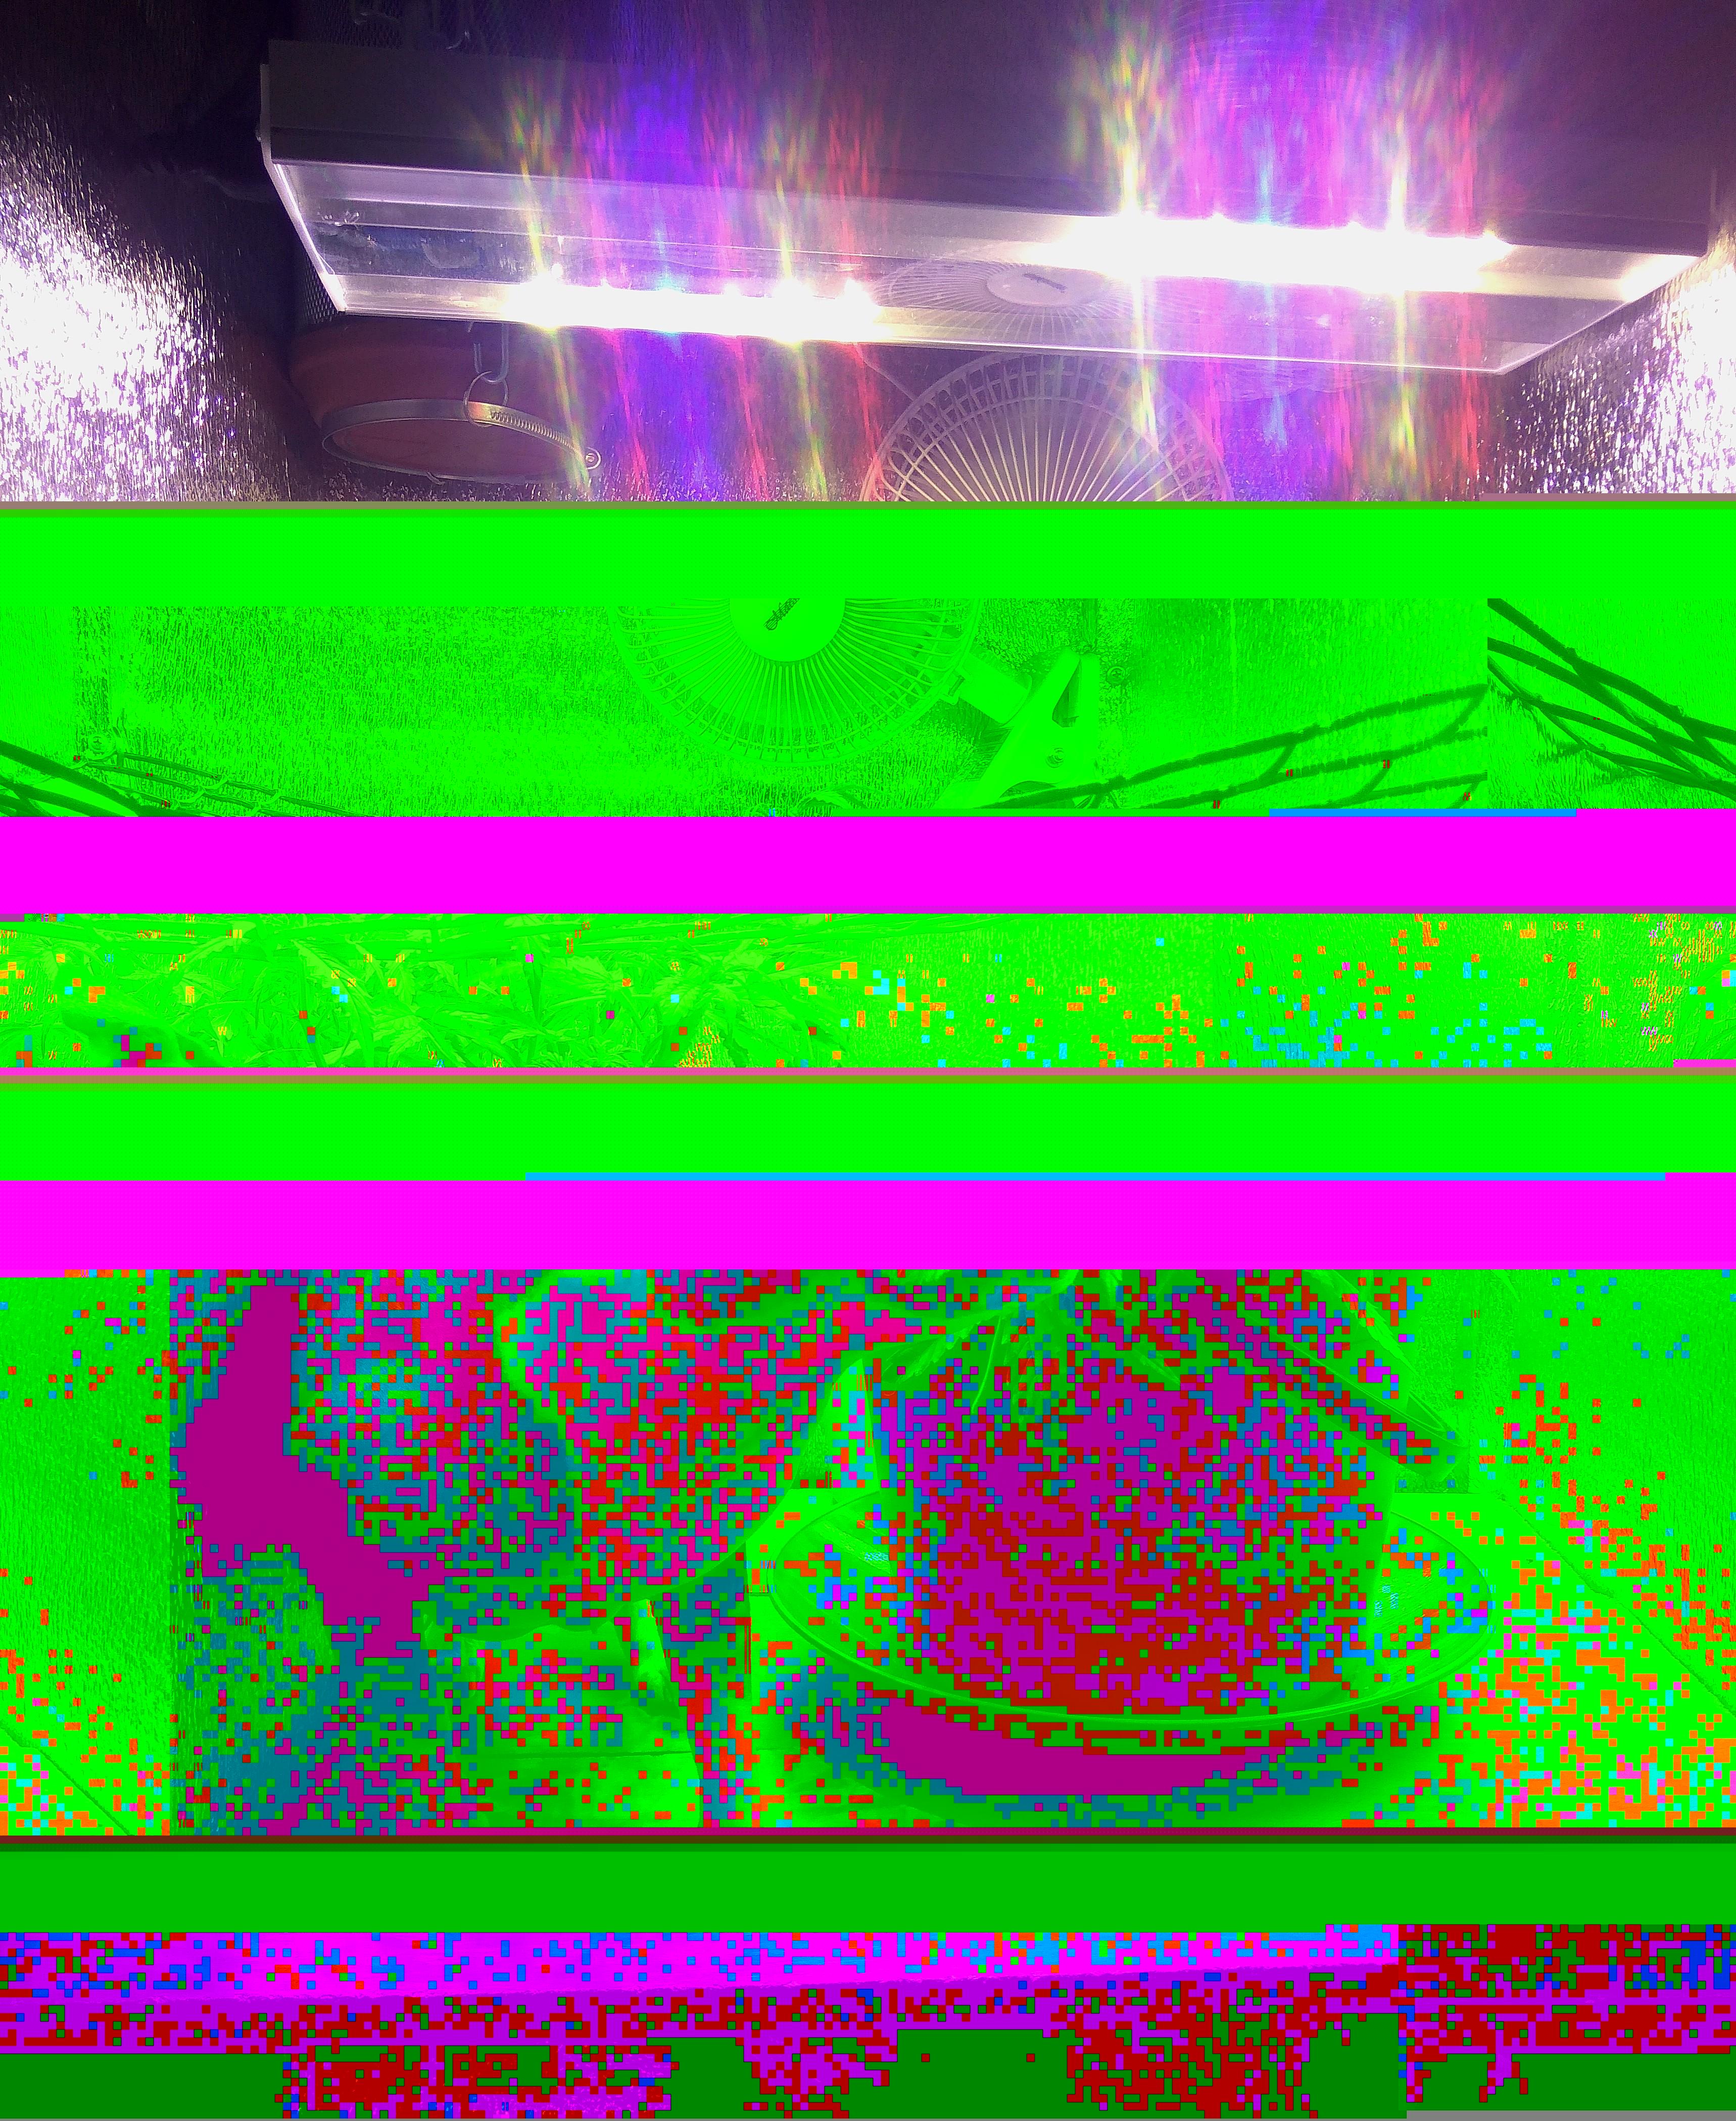 IMG_20180515_090135.jpg